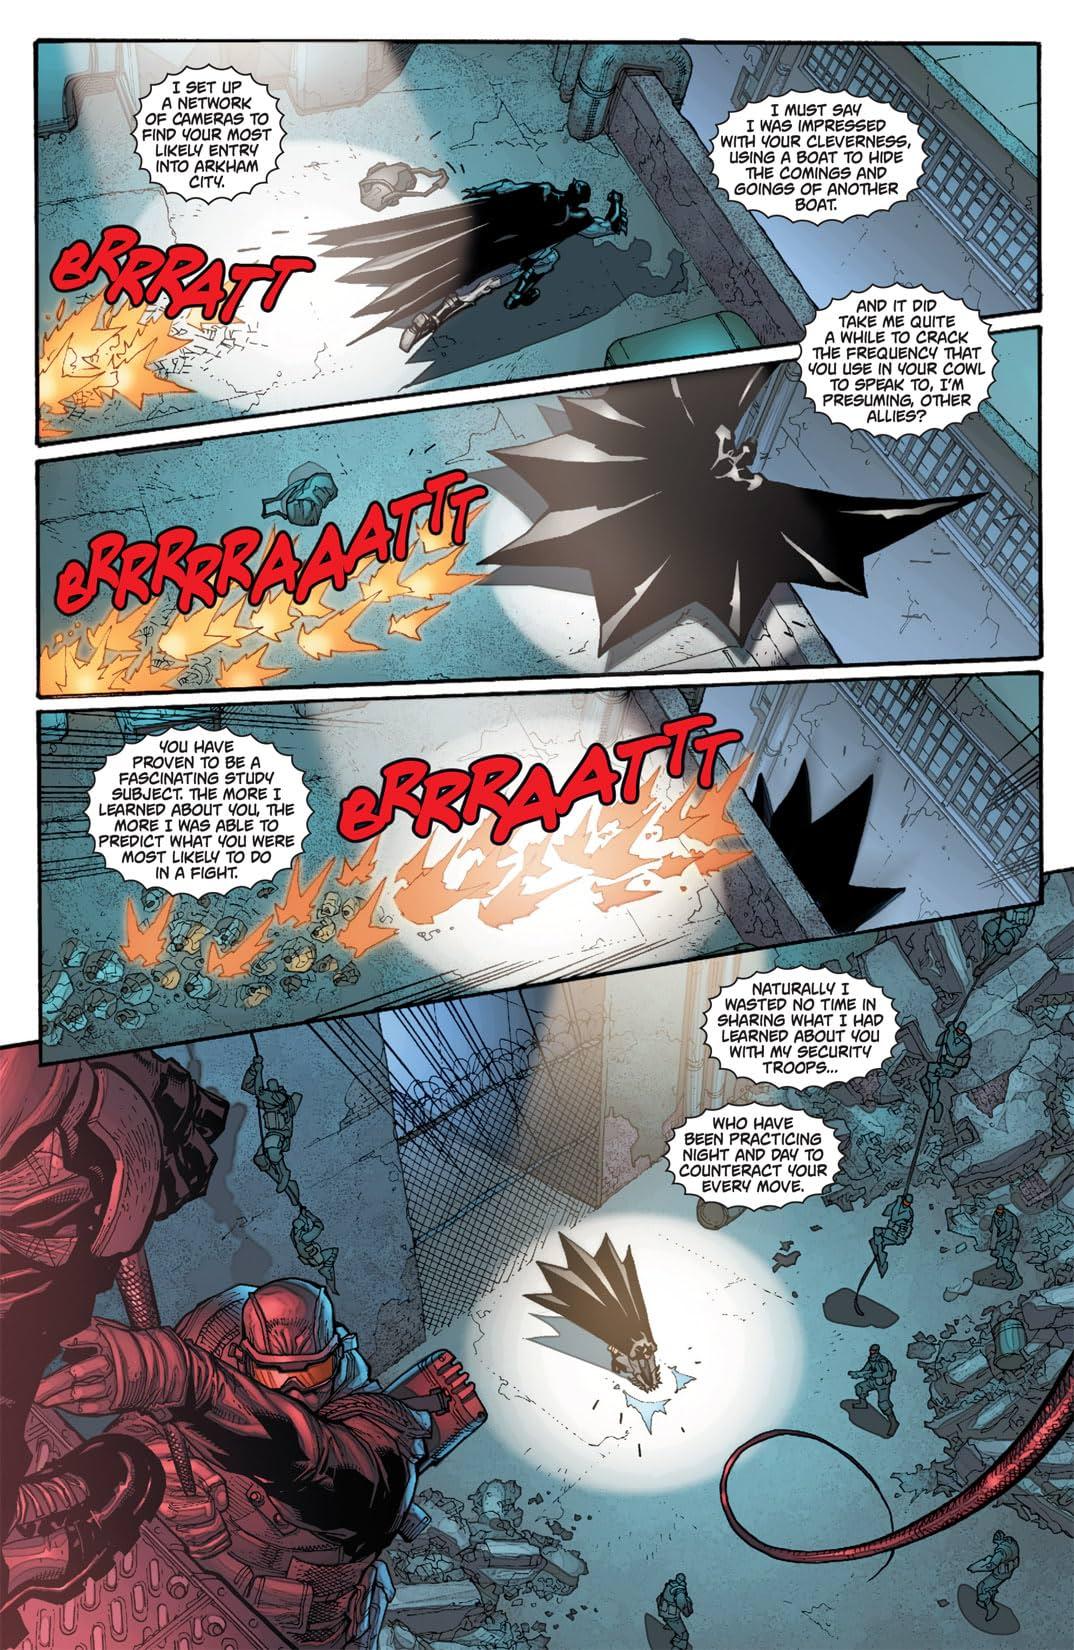 Batman: Arkham City #4 (of 5)